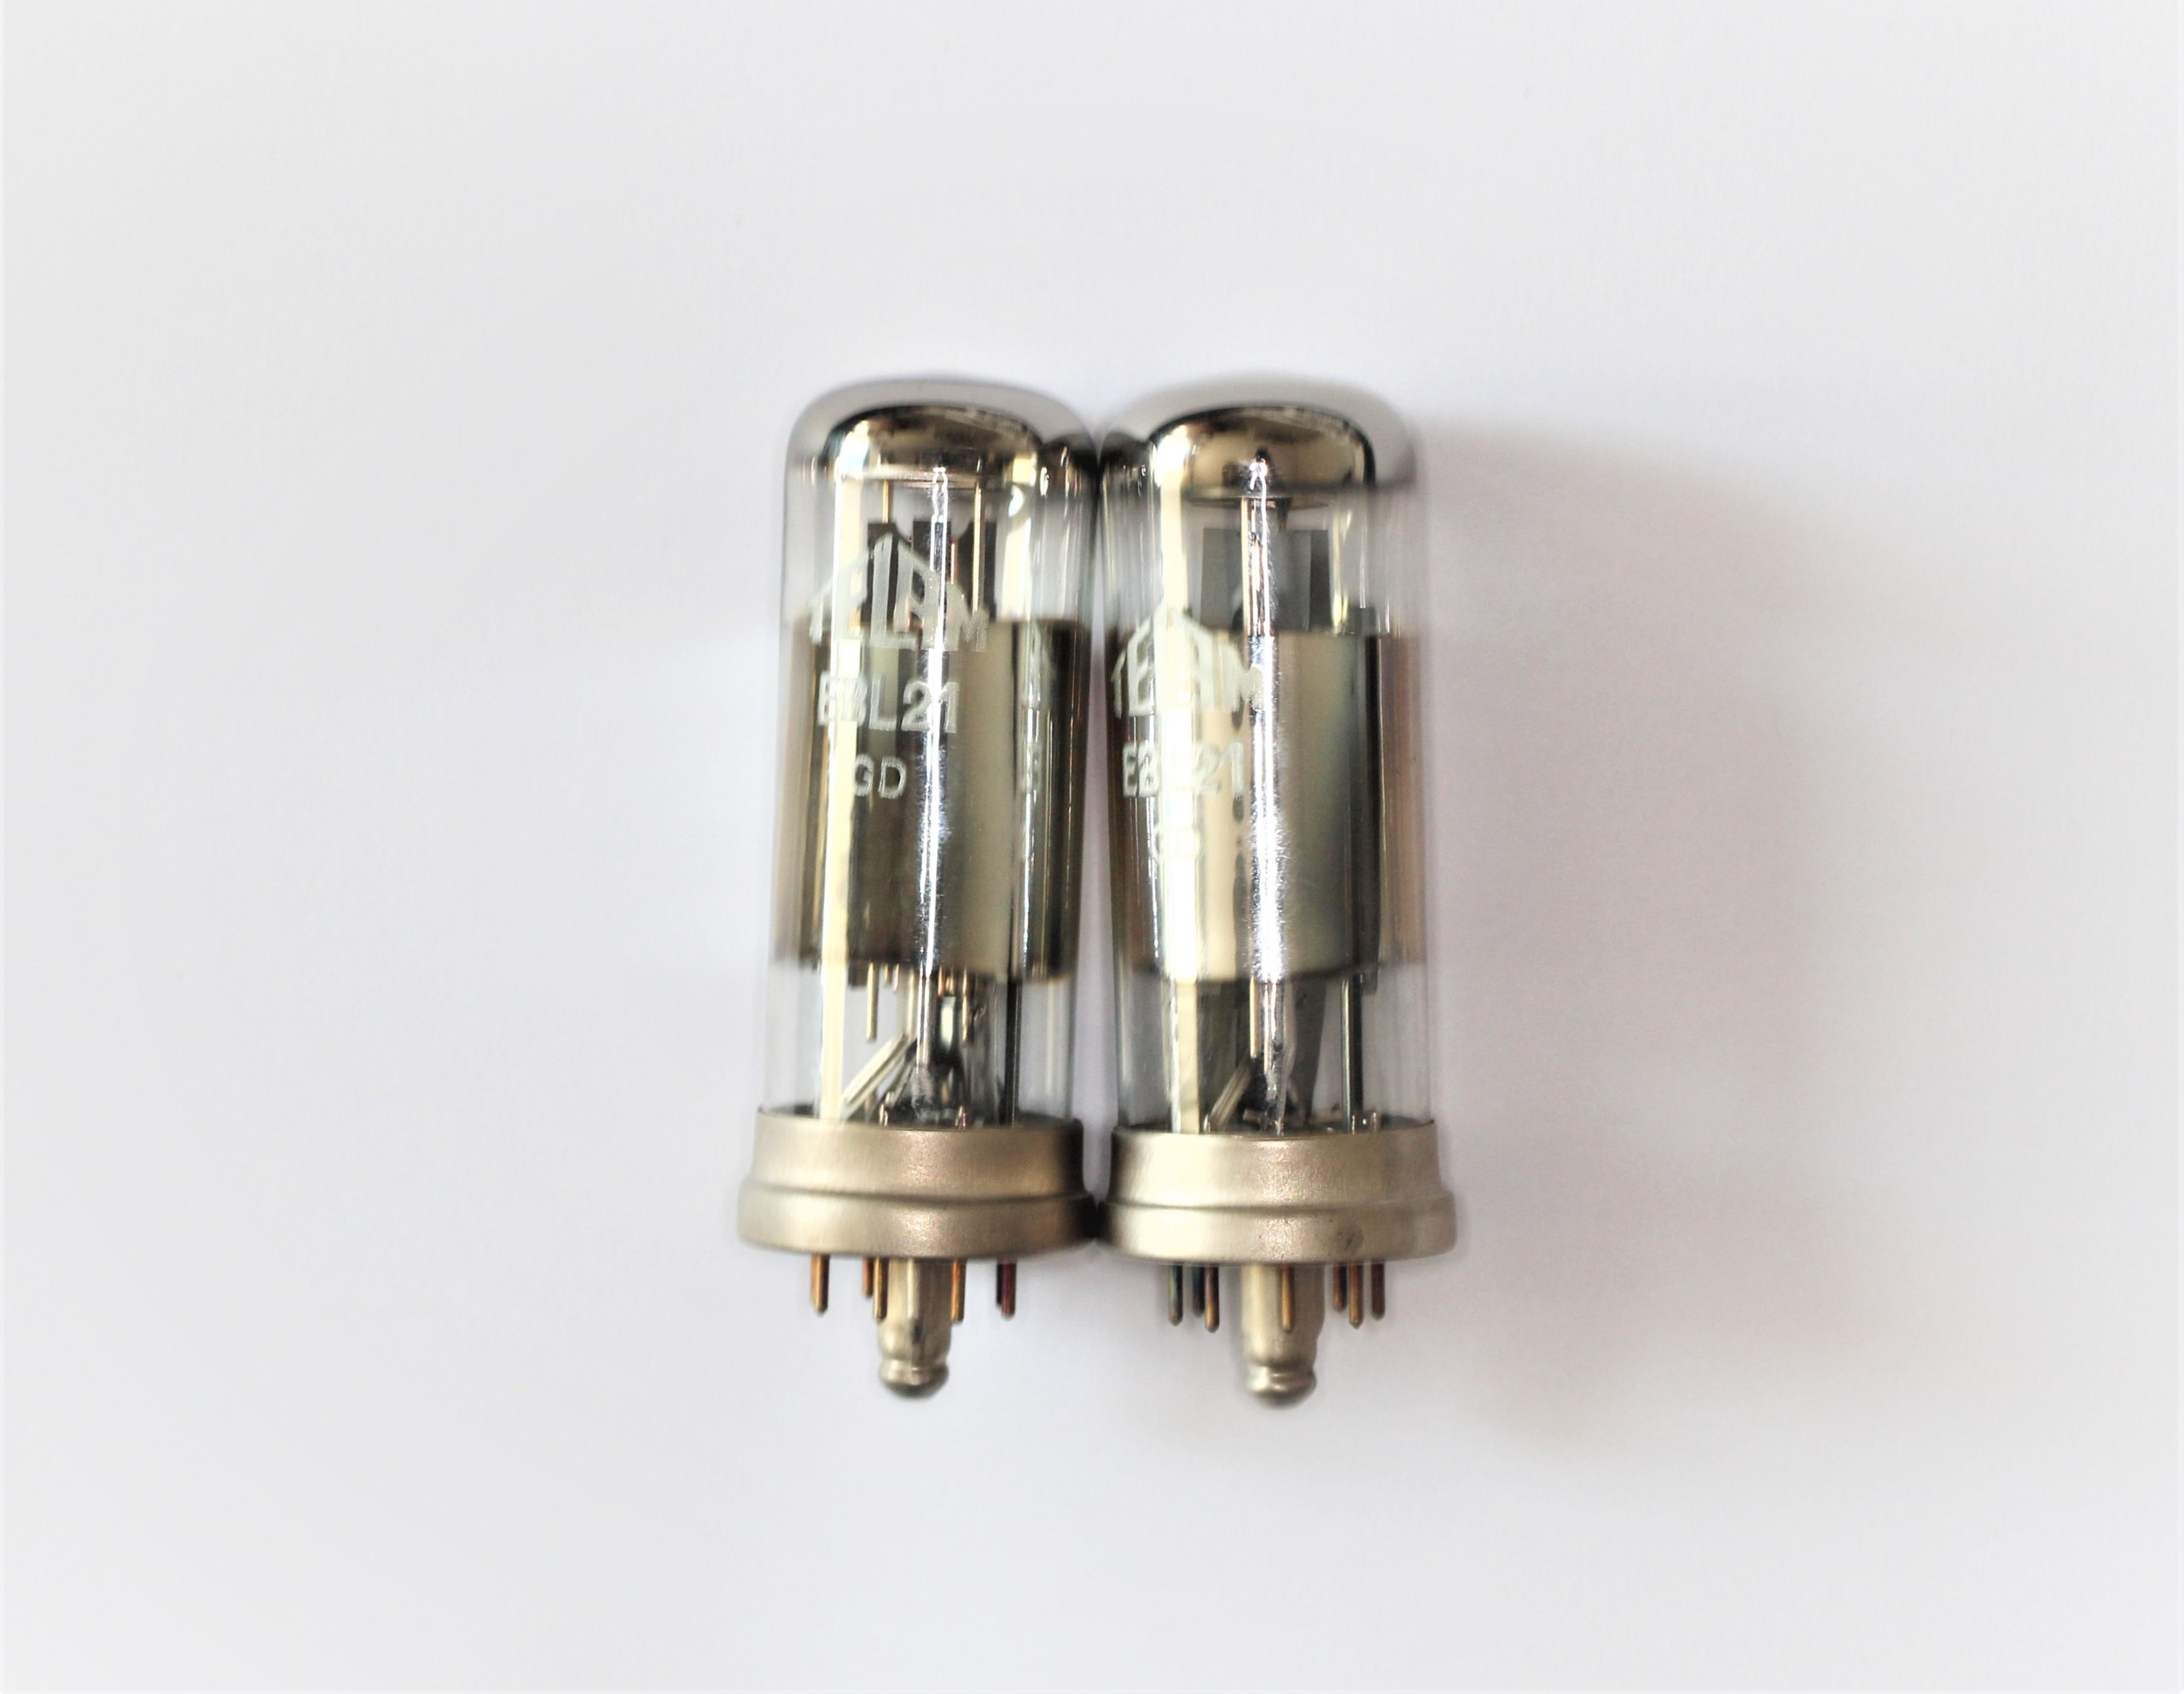 EBL21 (Telam) - co najmniej 110% - lampa elektr.